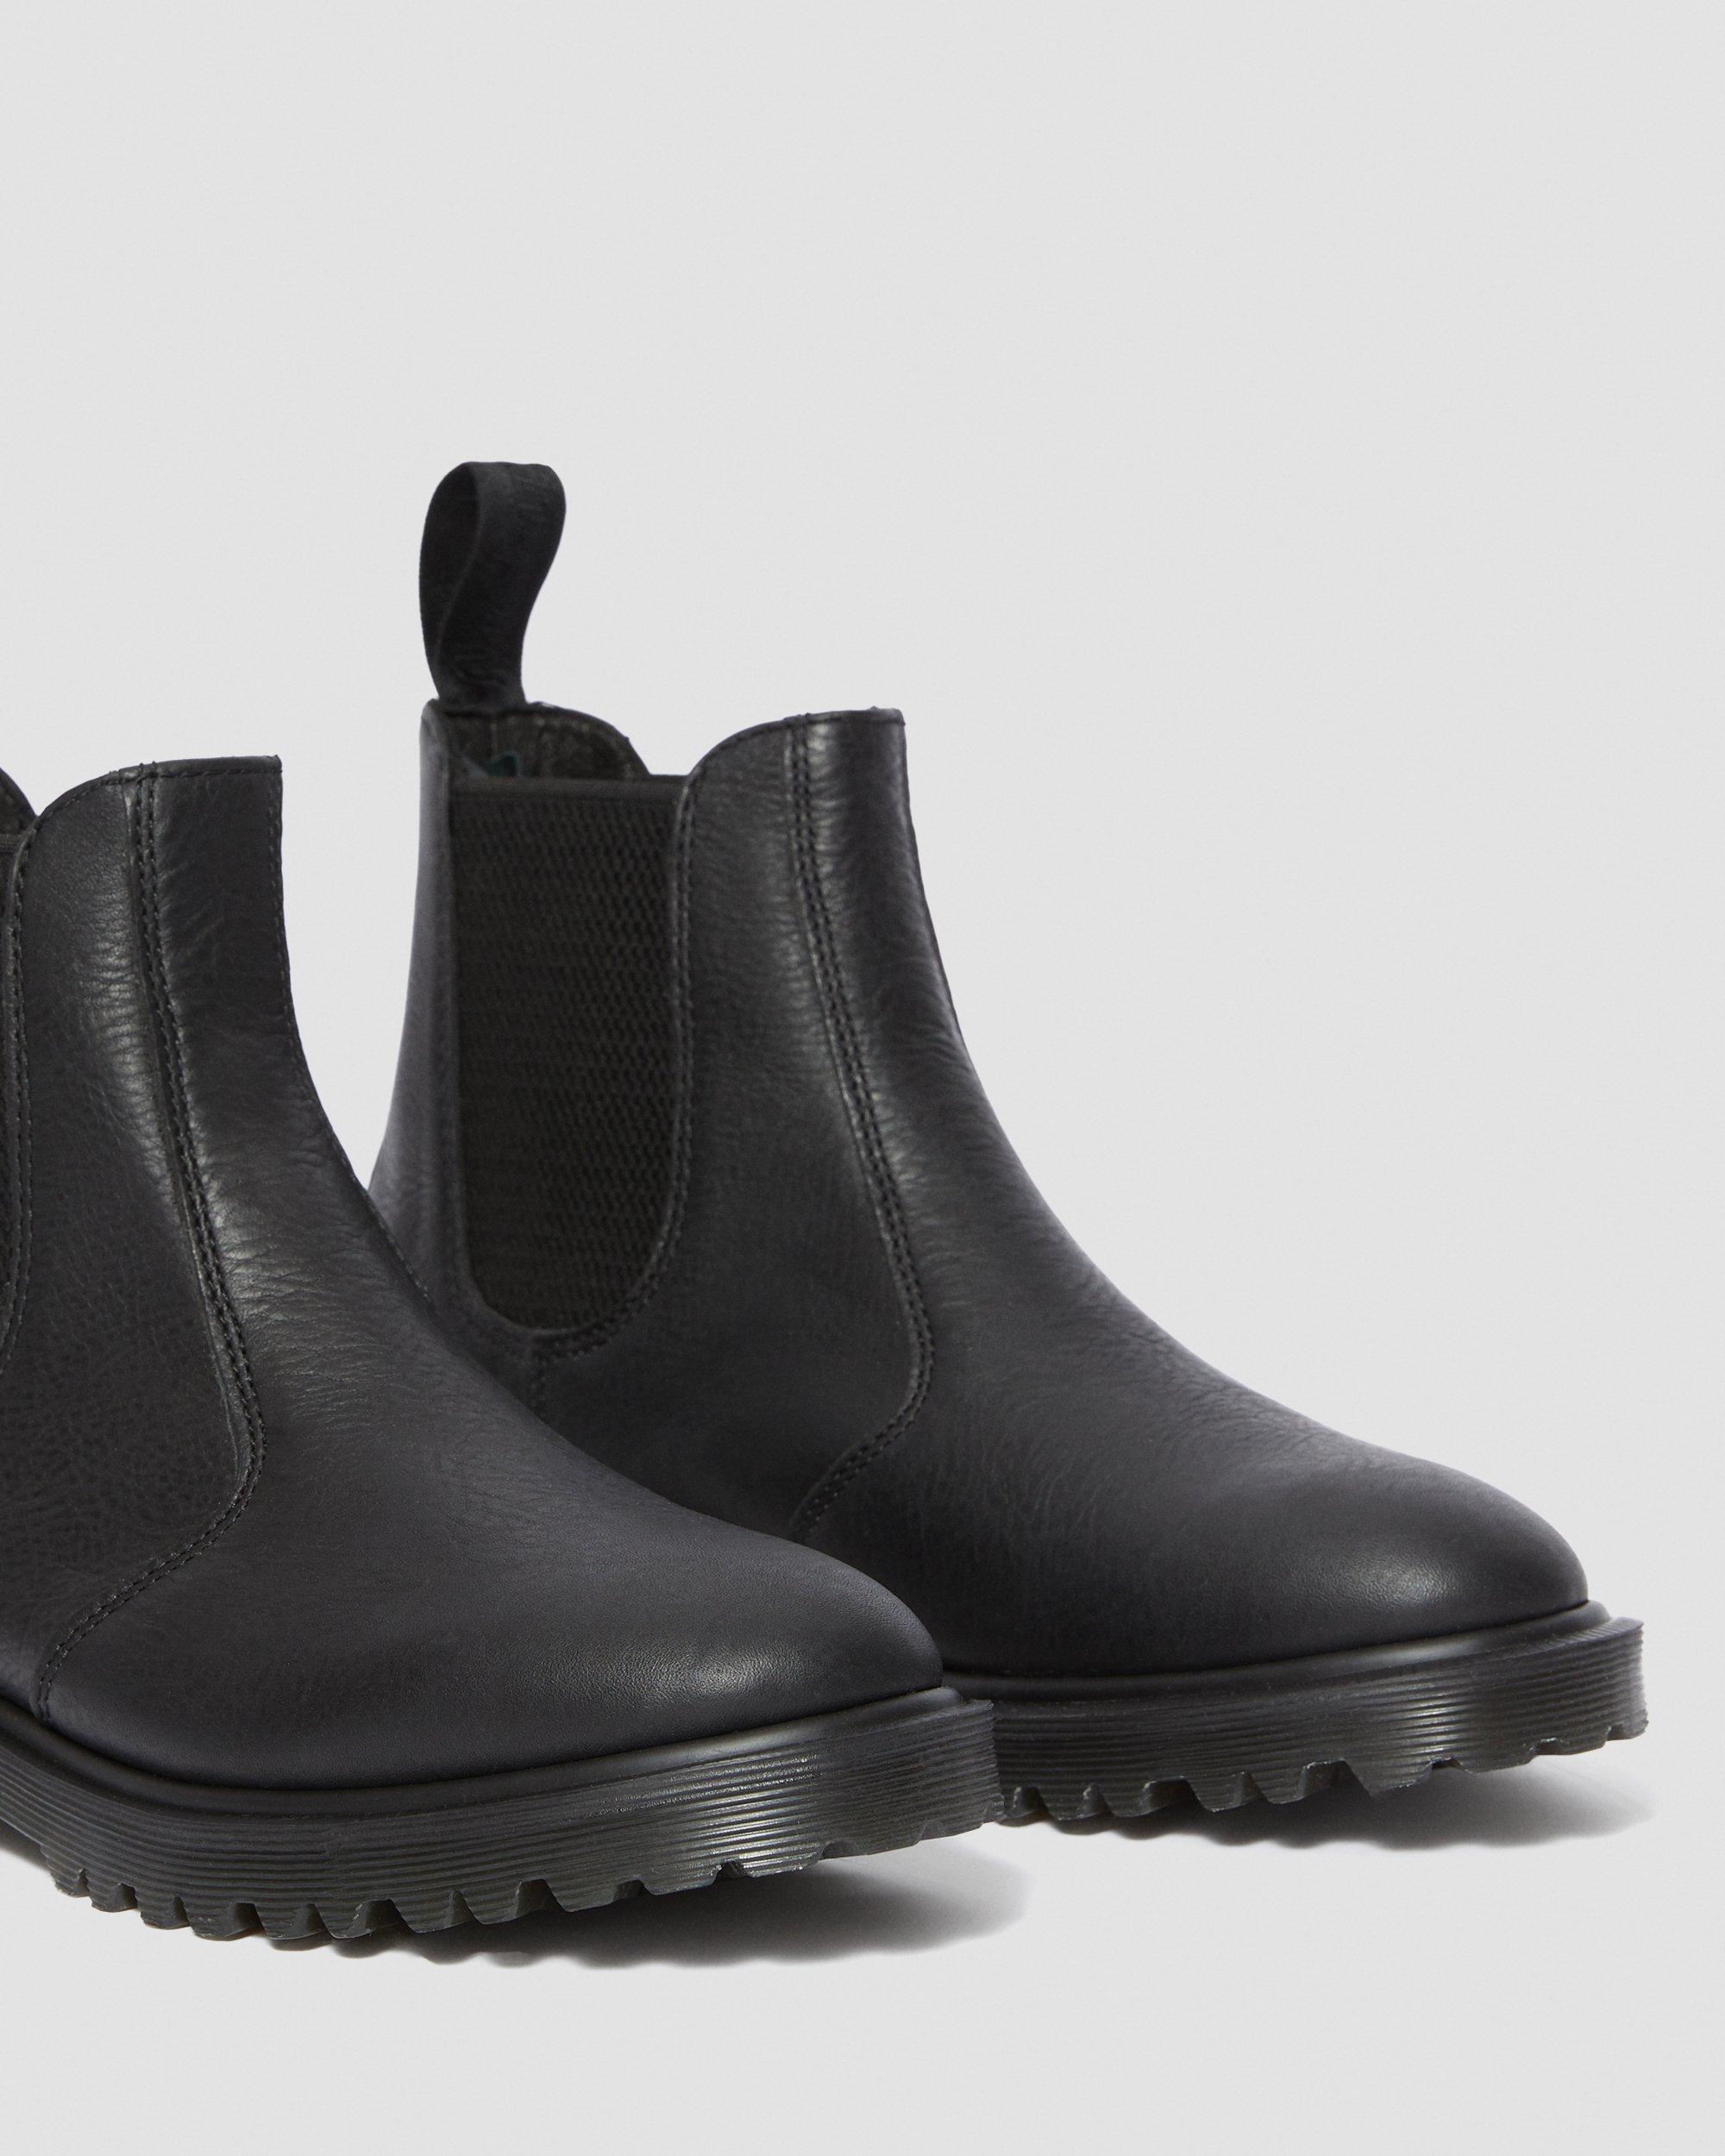 Dr Martens Industrial Work Boots M – Hatdao